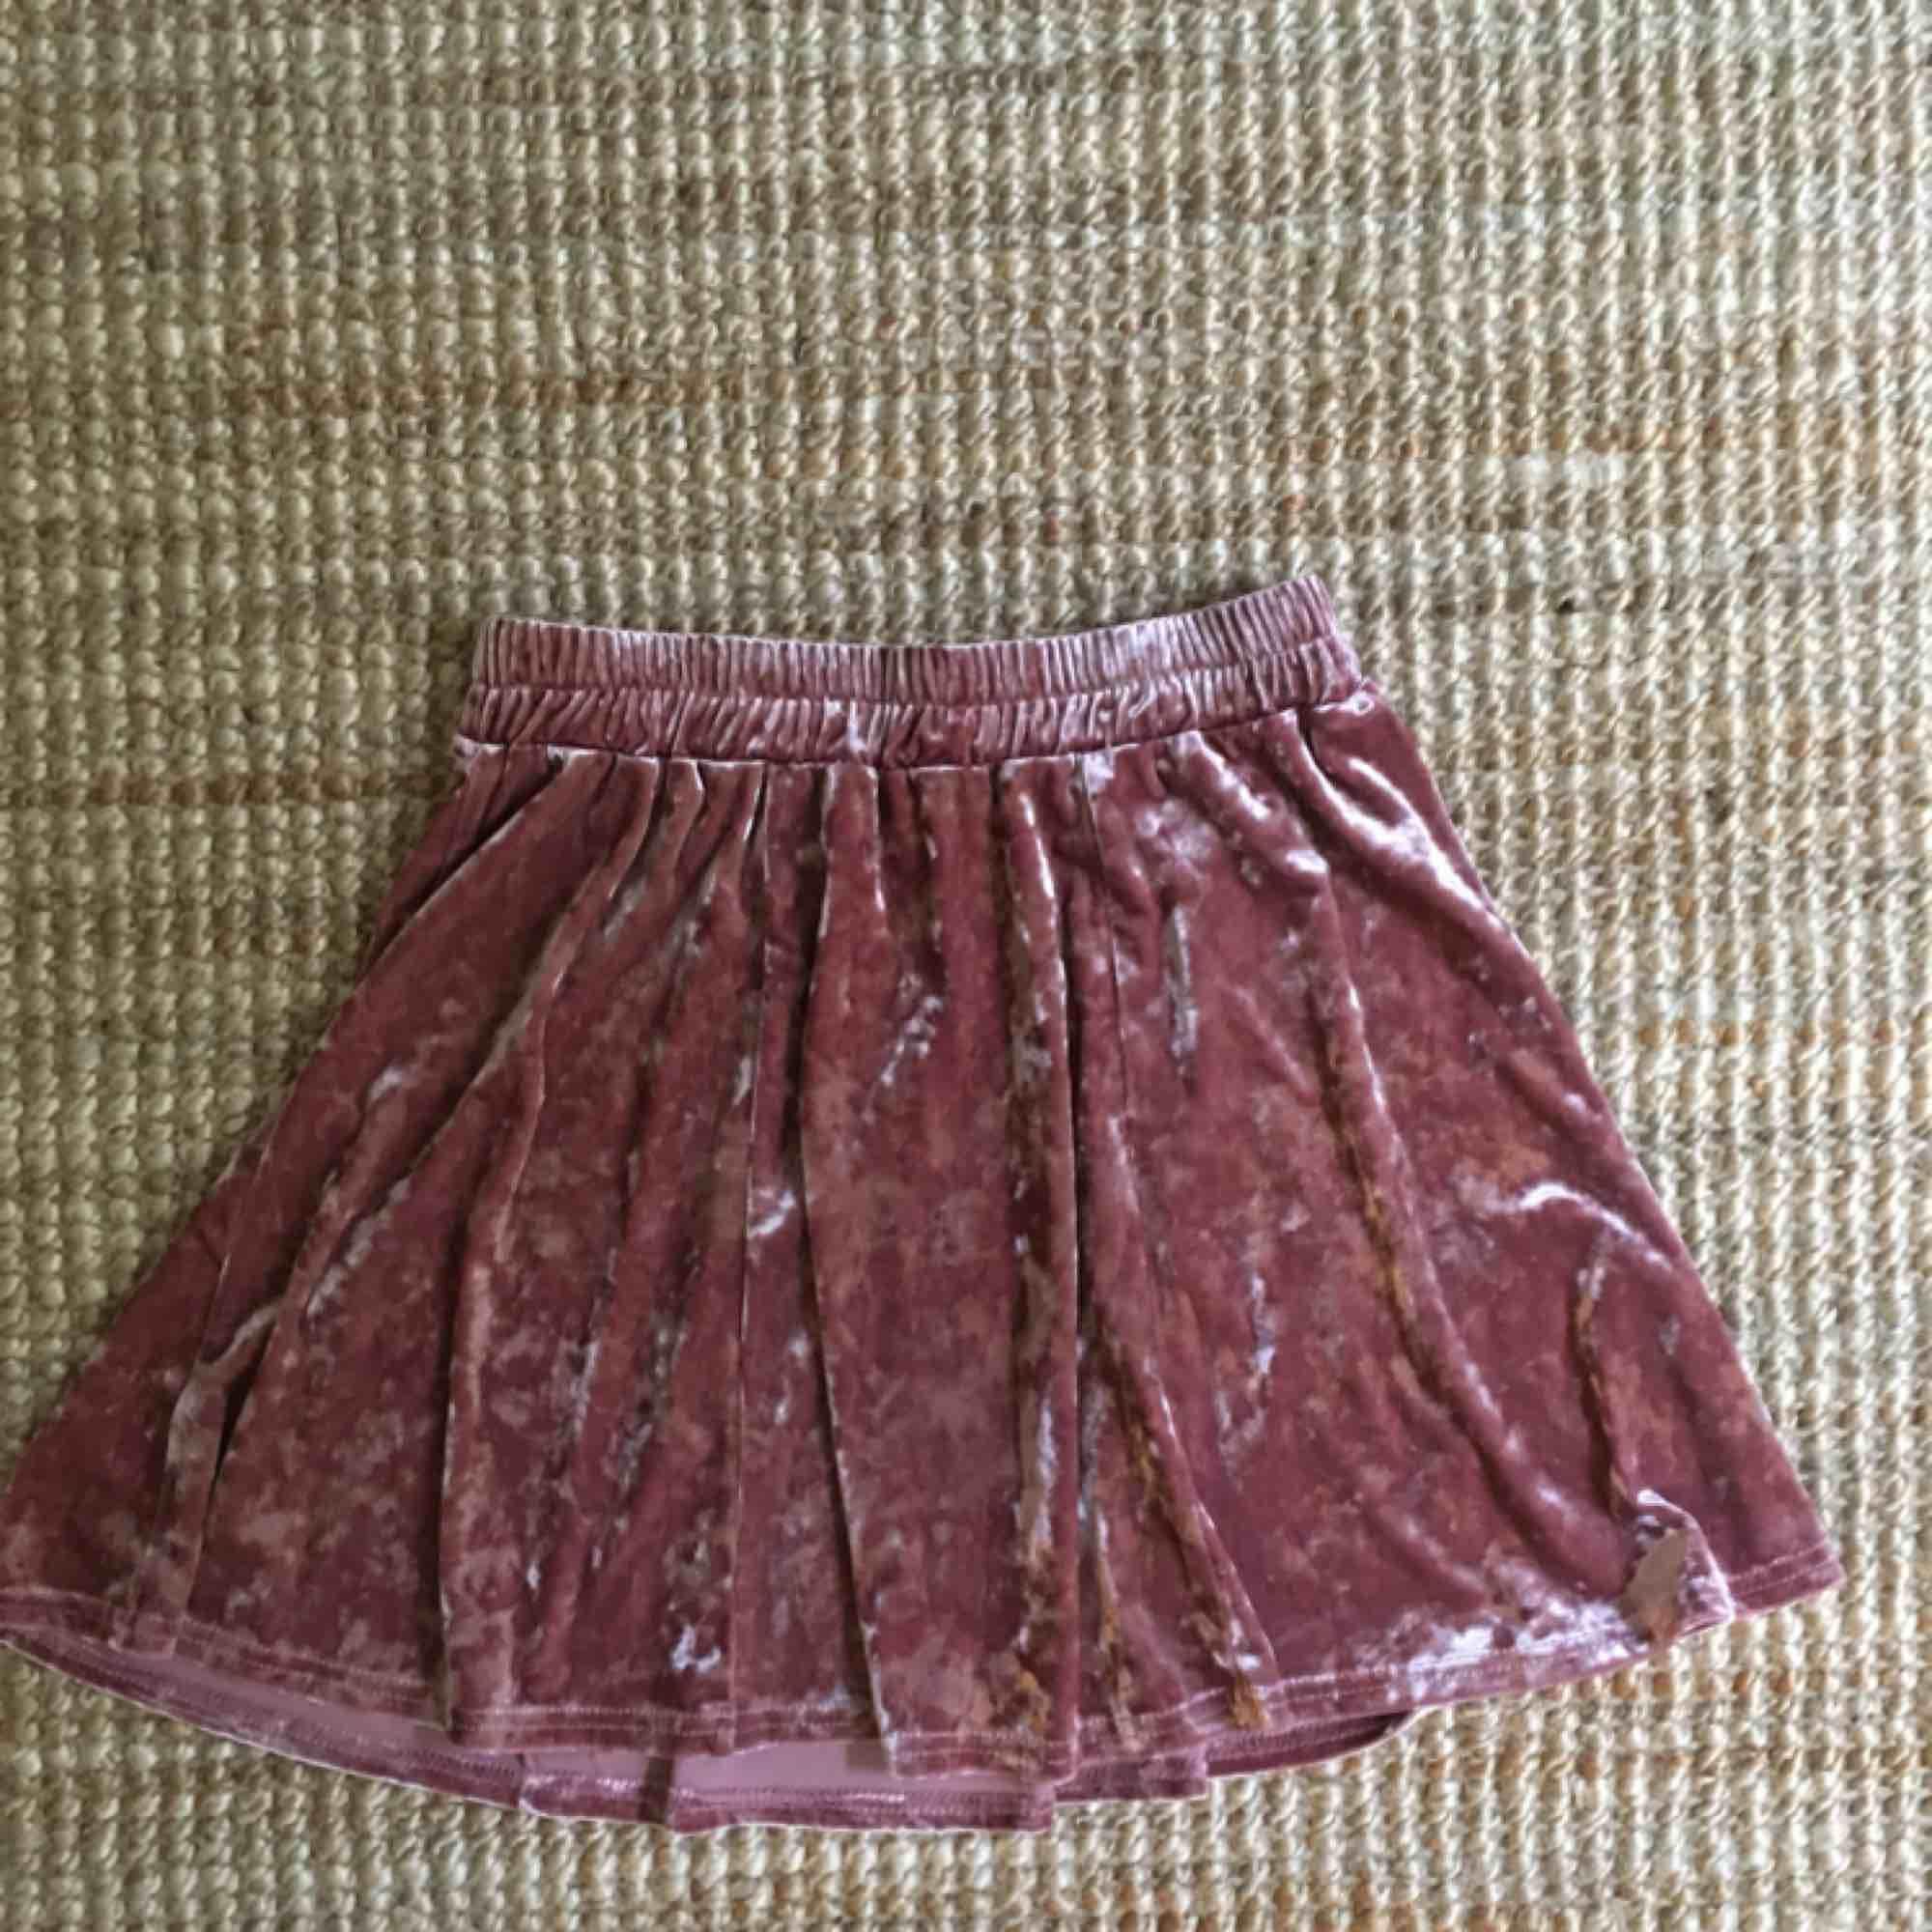 A-line/skater-kjol från Urban Outfitters i stl S. I rosa sammet💖. Kjolar.